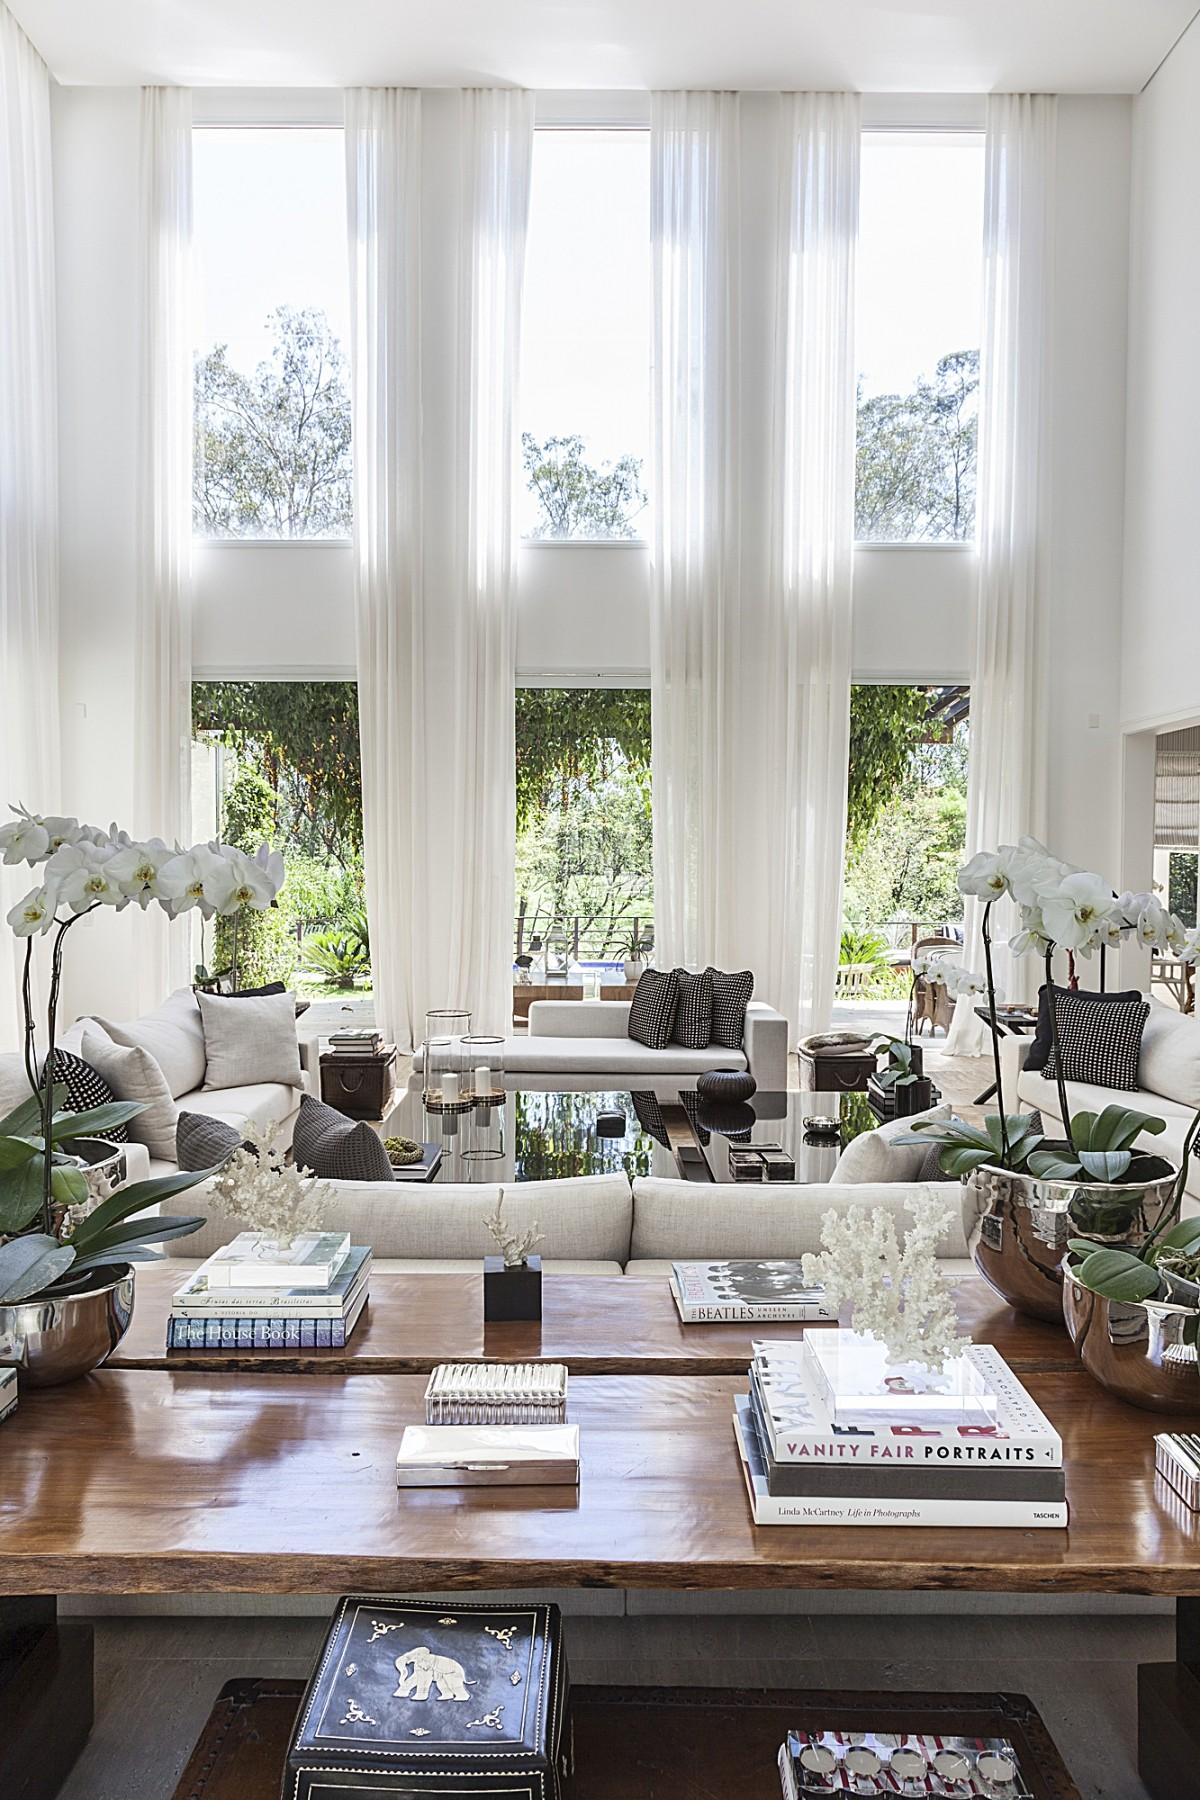 Designers de Interiores Brasileiros: Cris Hamoui